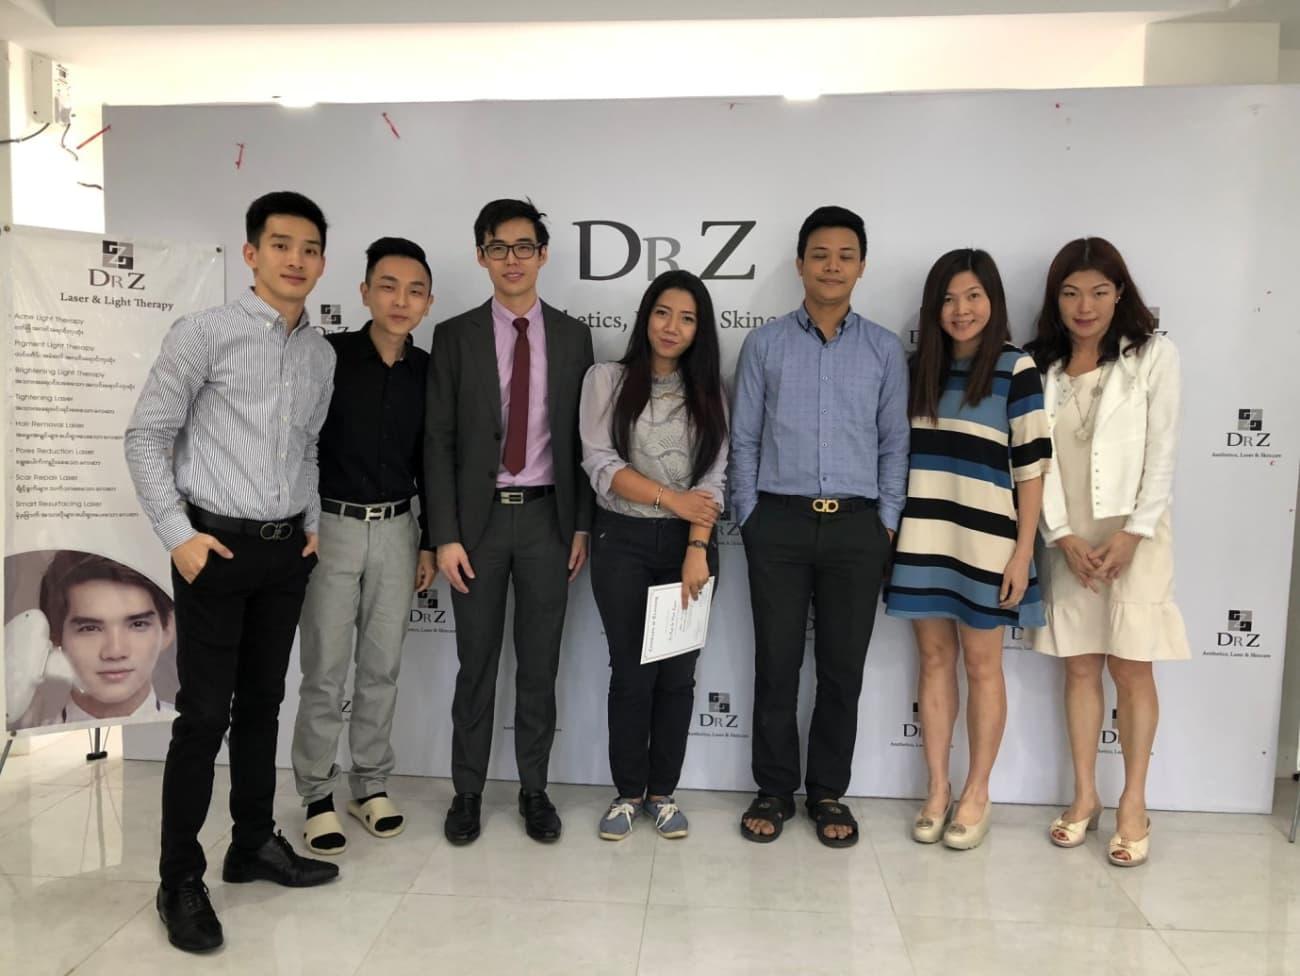 Dr CY Chua, Elogio Asia and DrZ Clinic